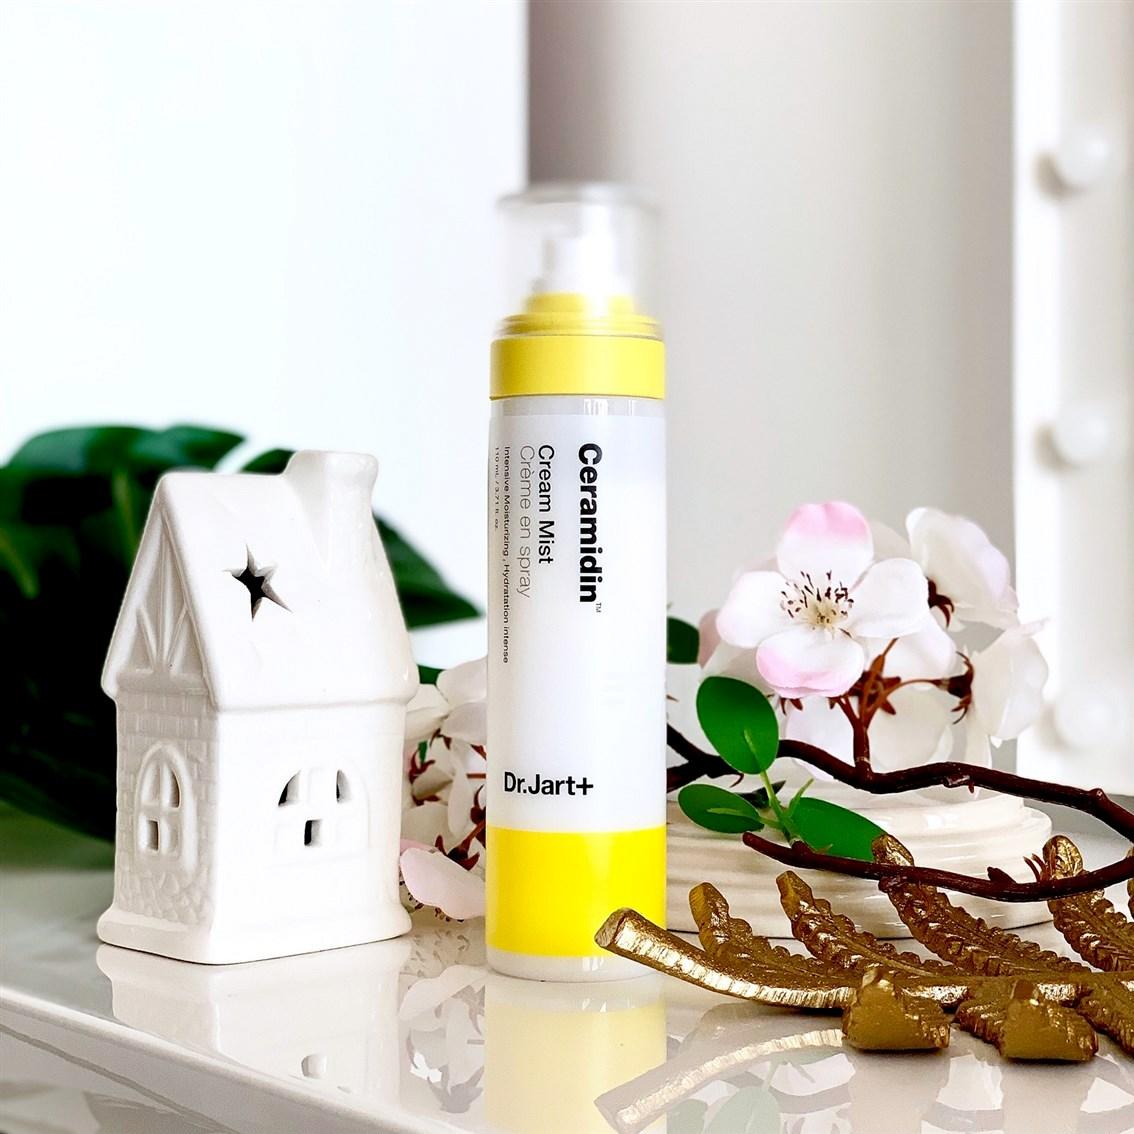 Dr. Jart+ Ceramidin Cream Mist krem w sprayu blog